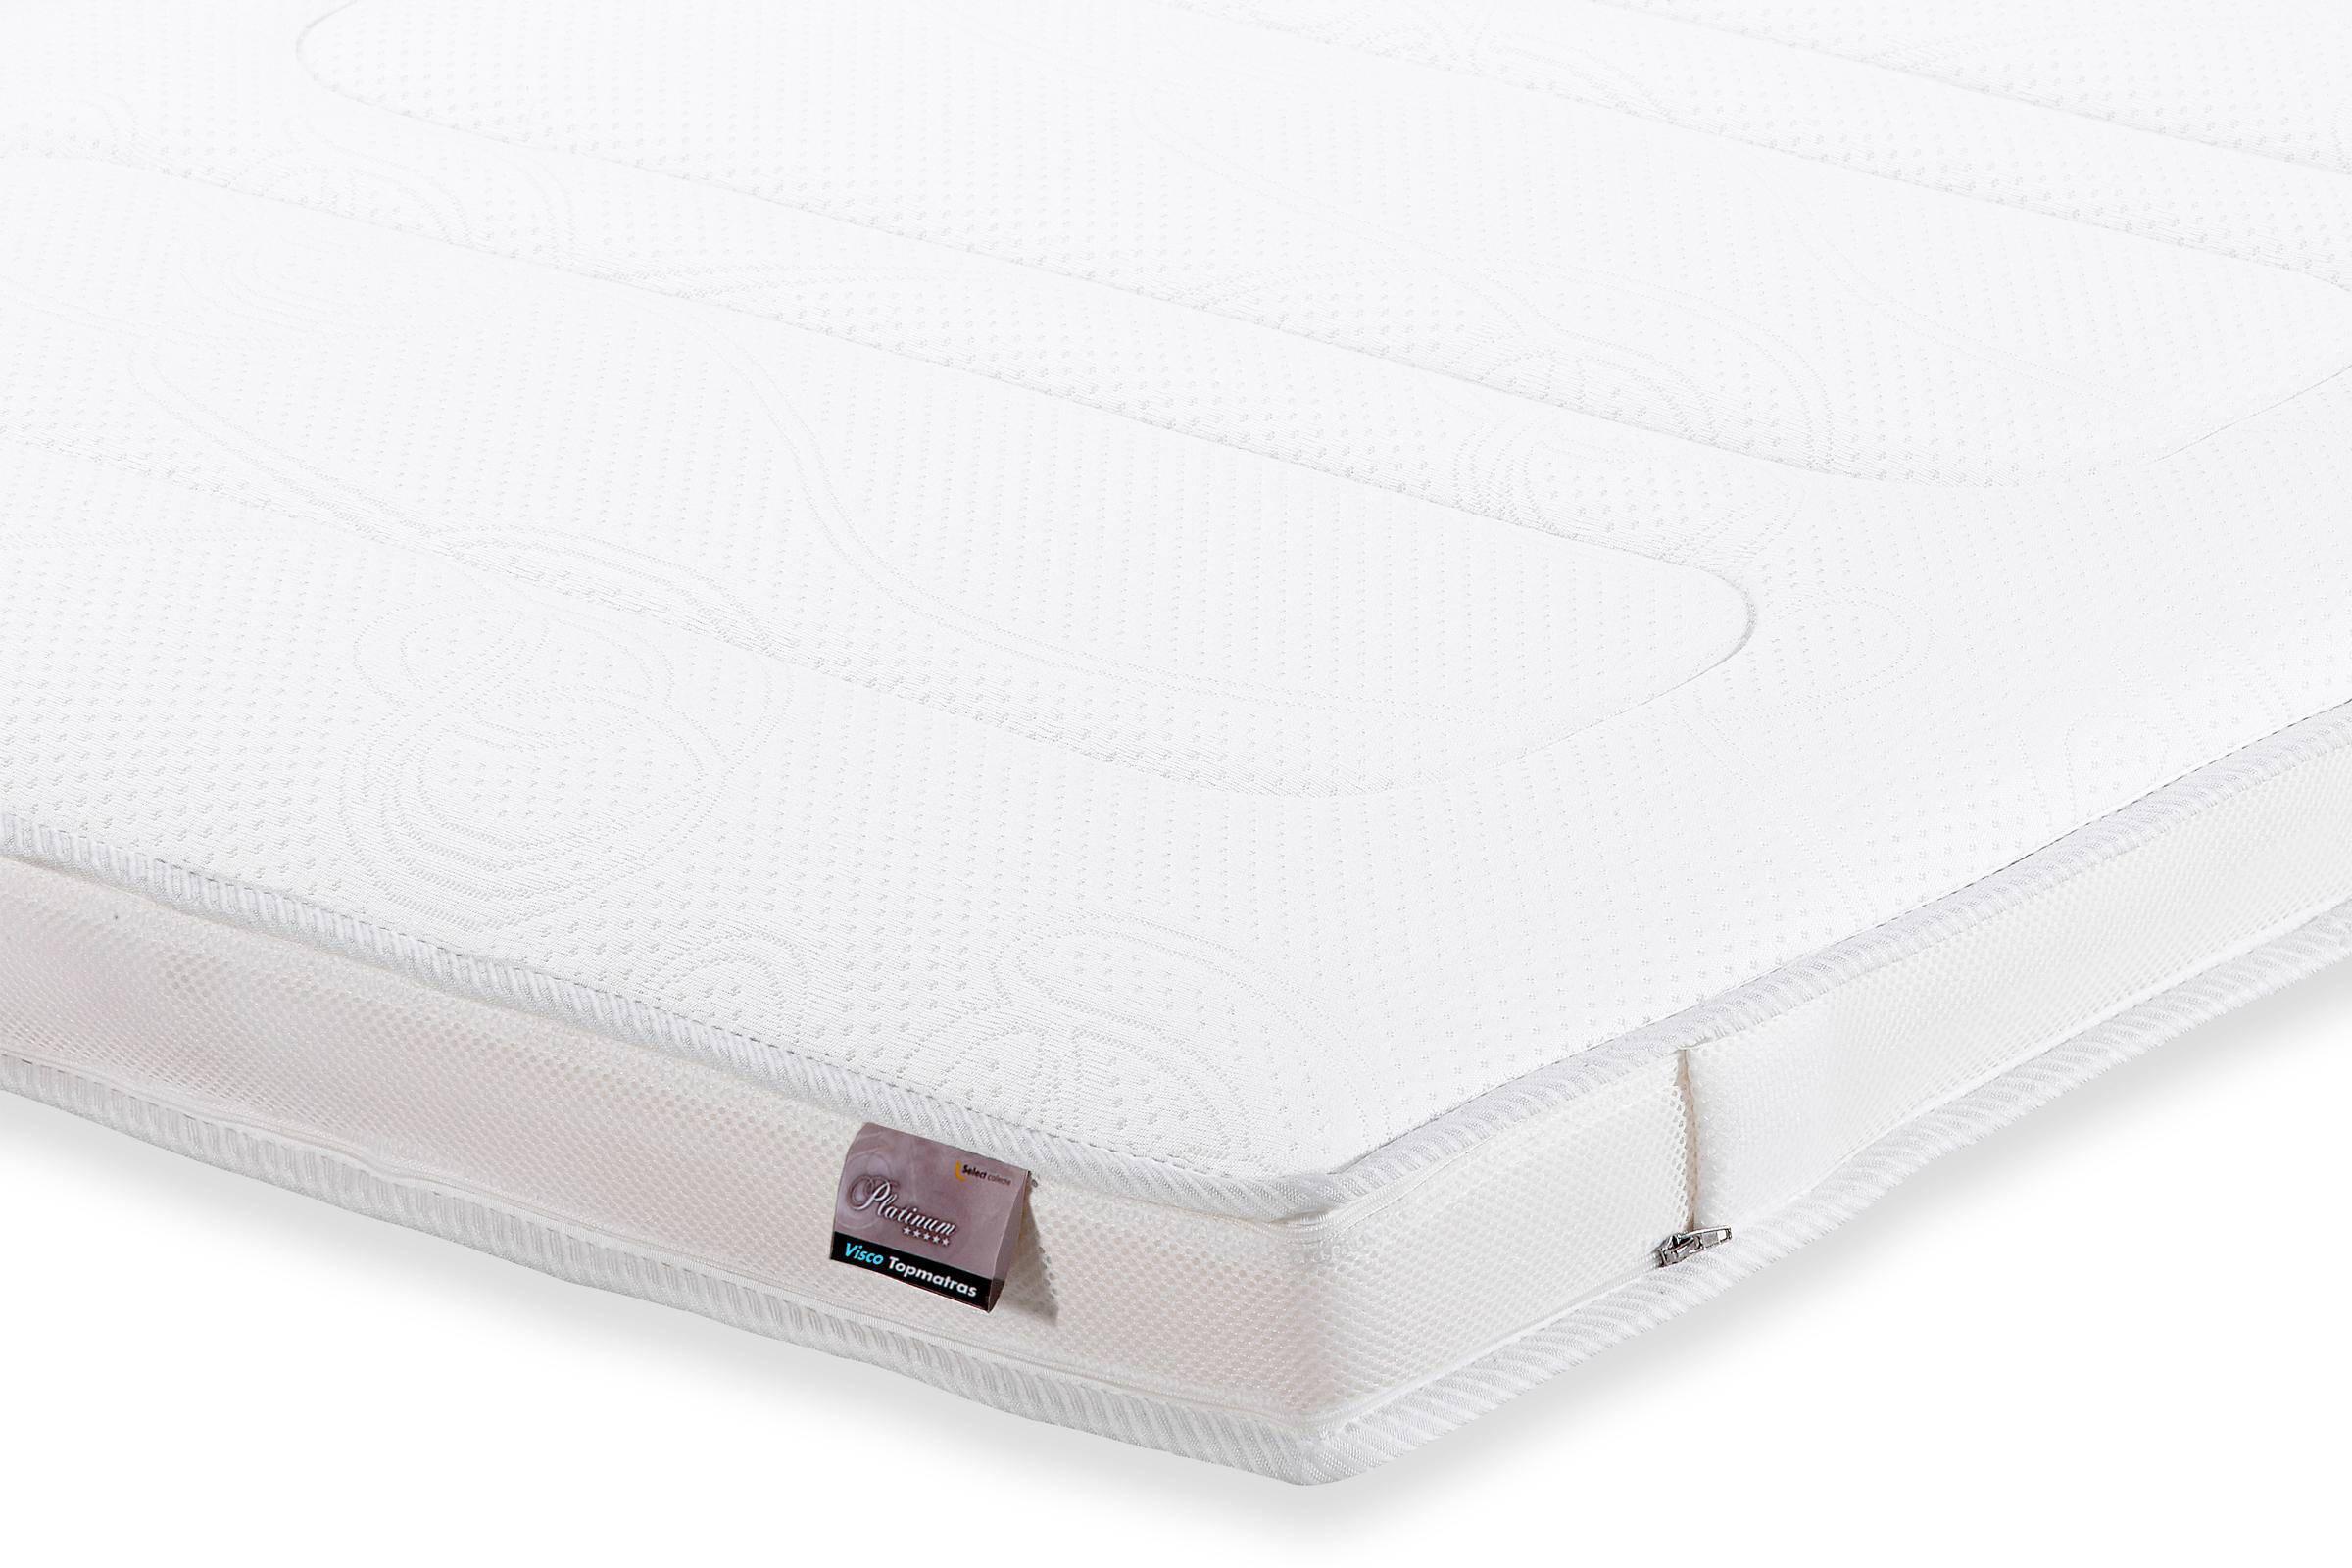 Topmatras Beter Bed.Topmatras Platinum Visco 180x200 Cm